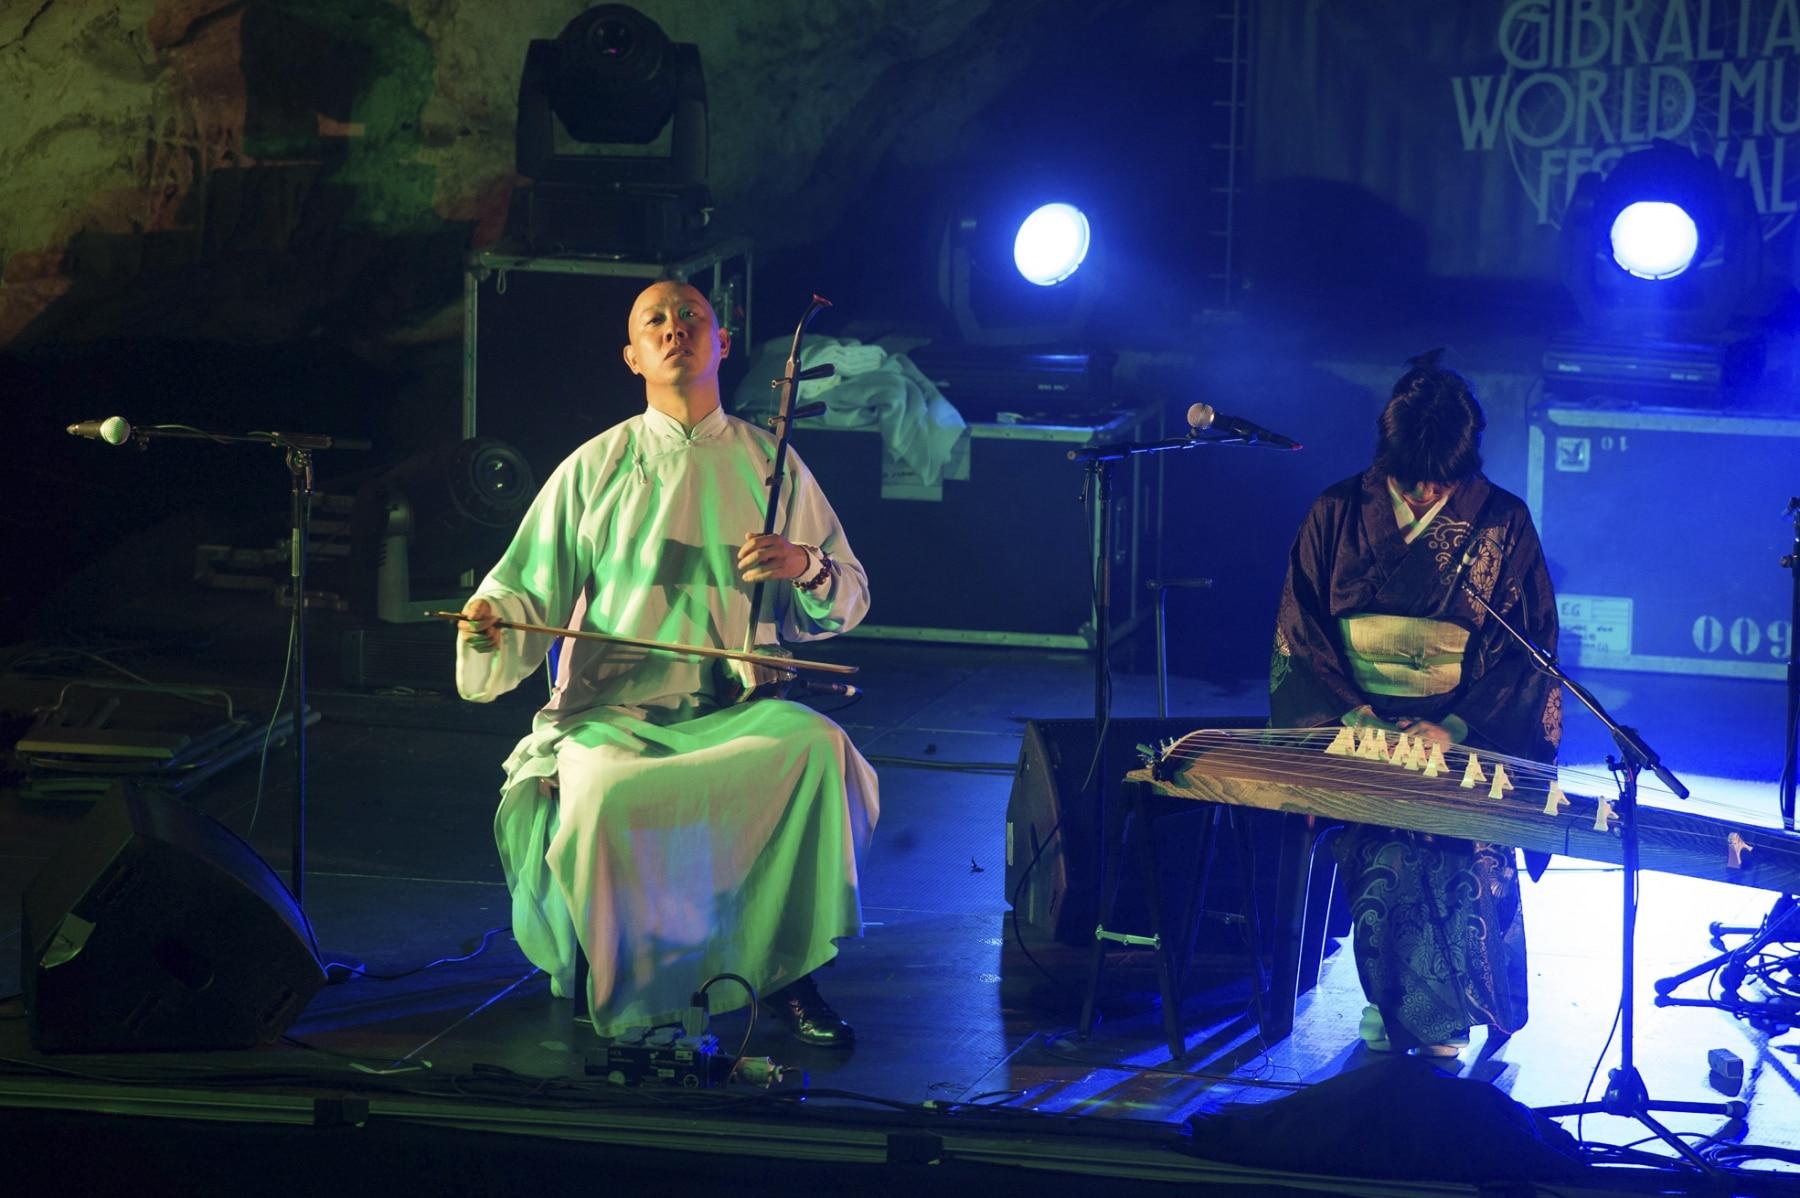 19-mayo-gibraltar-world-music-festival04_14277759000_o